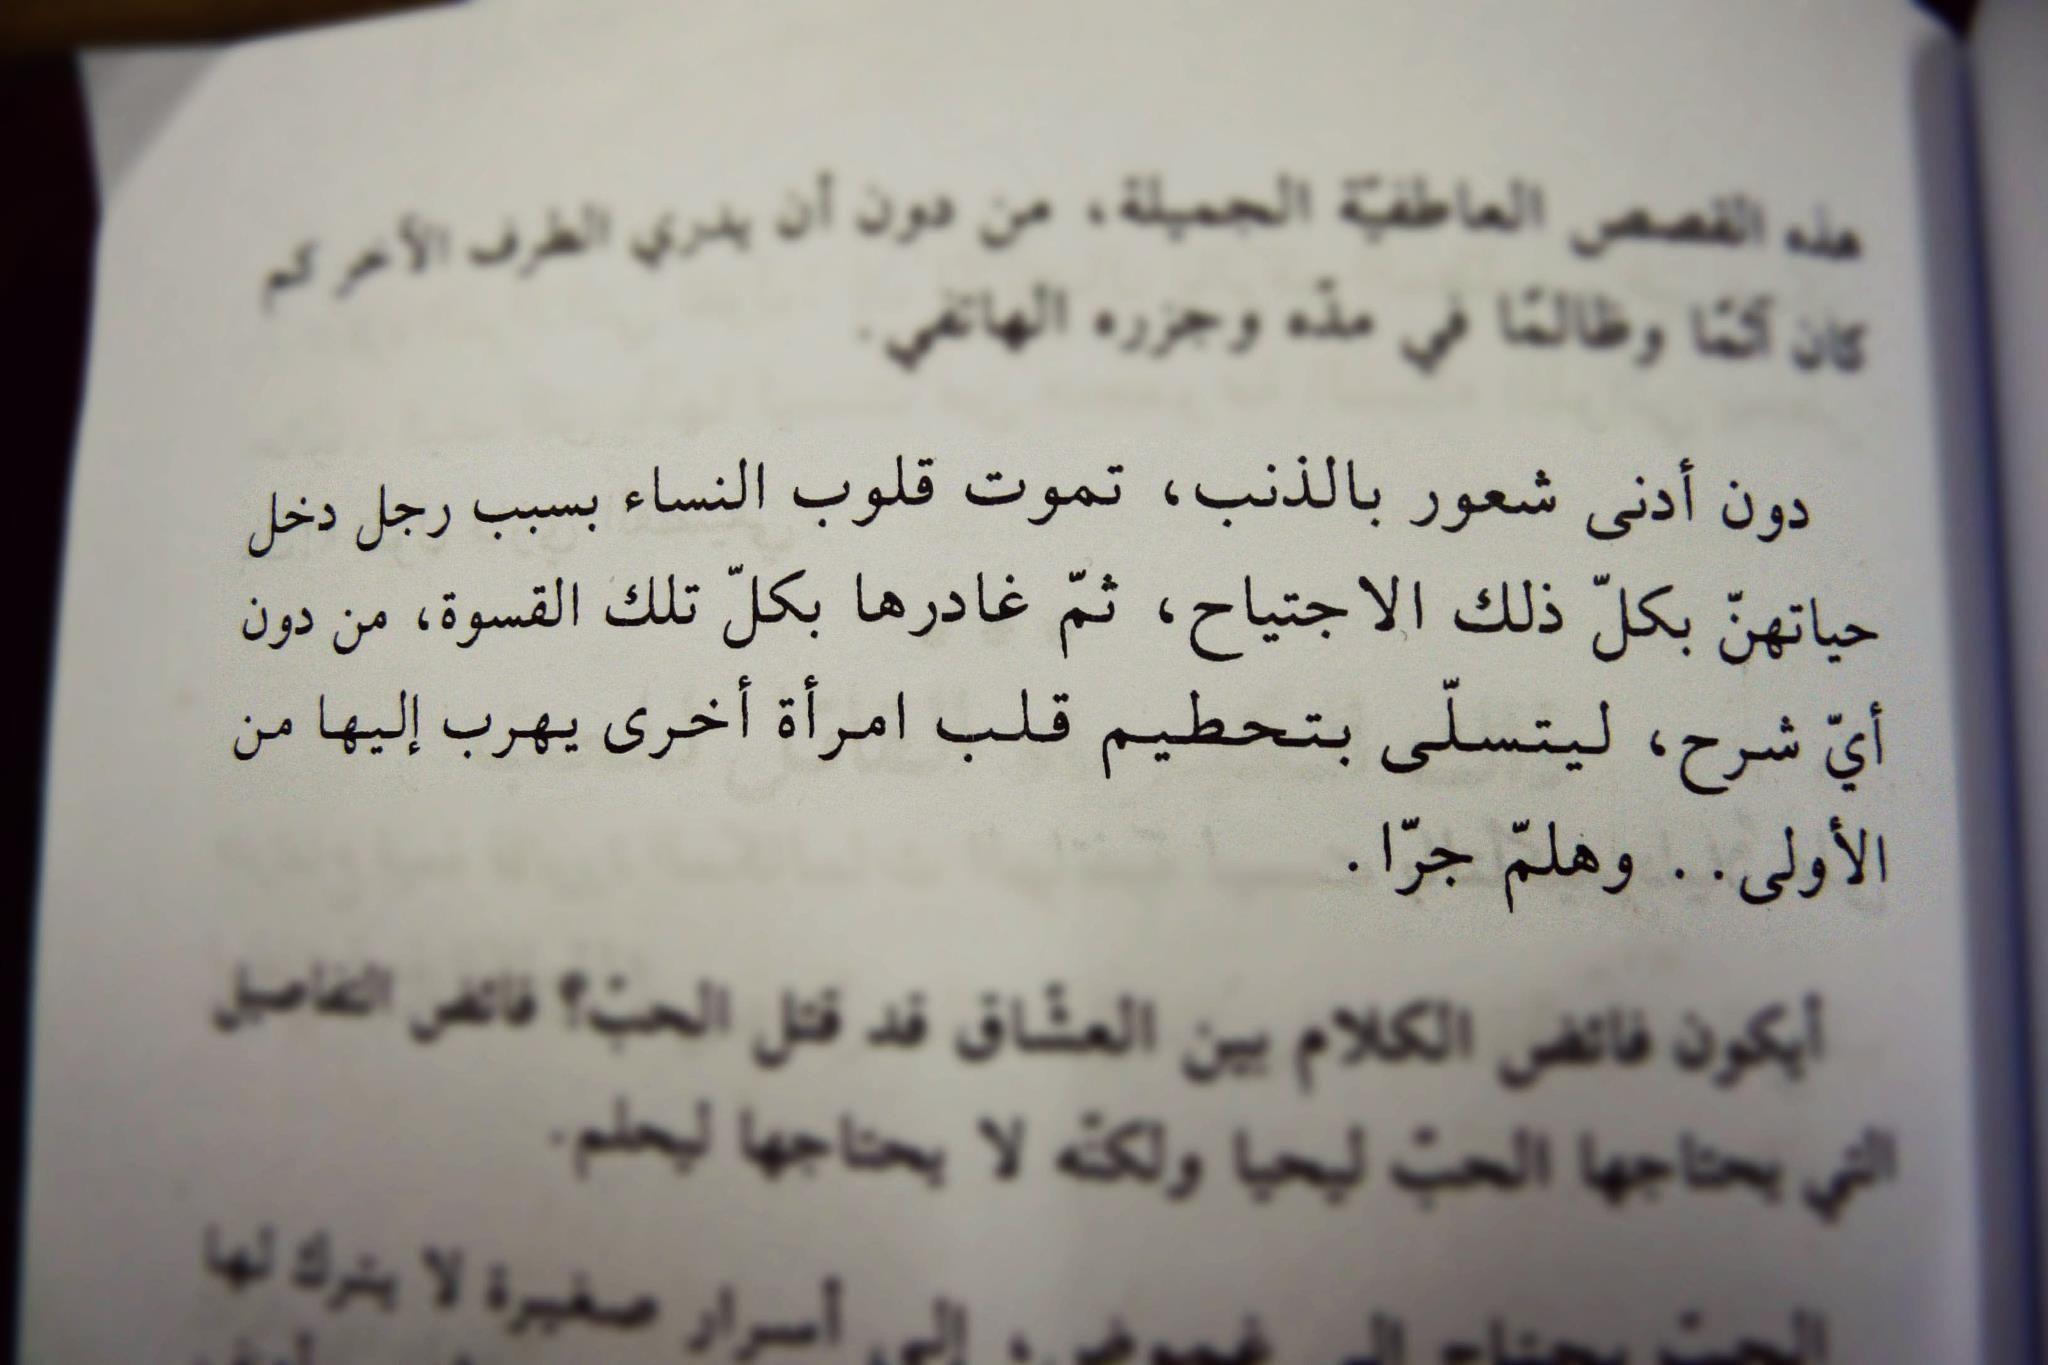 دون أدنى شعور بالذنب Words Quotes Arabic Quotes